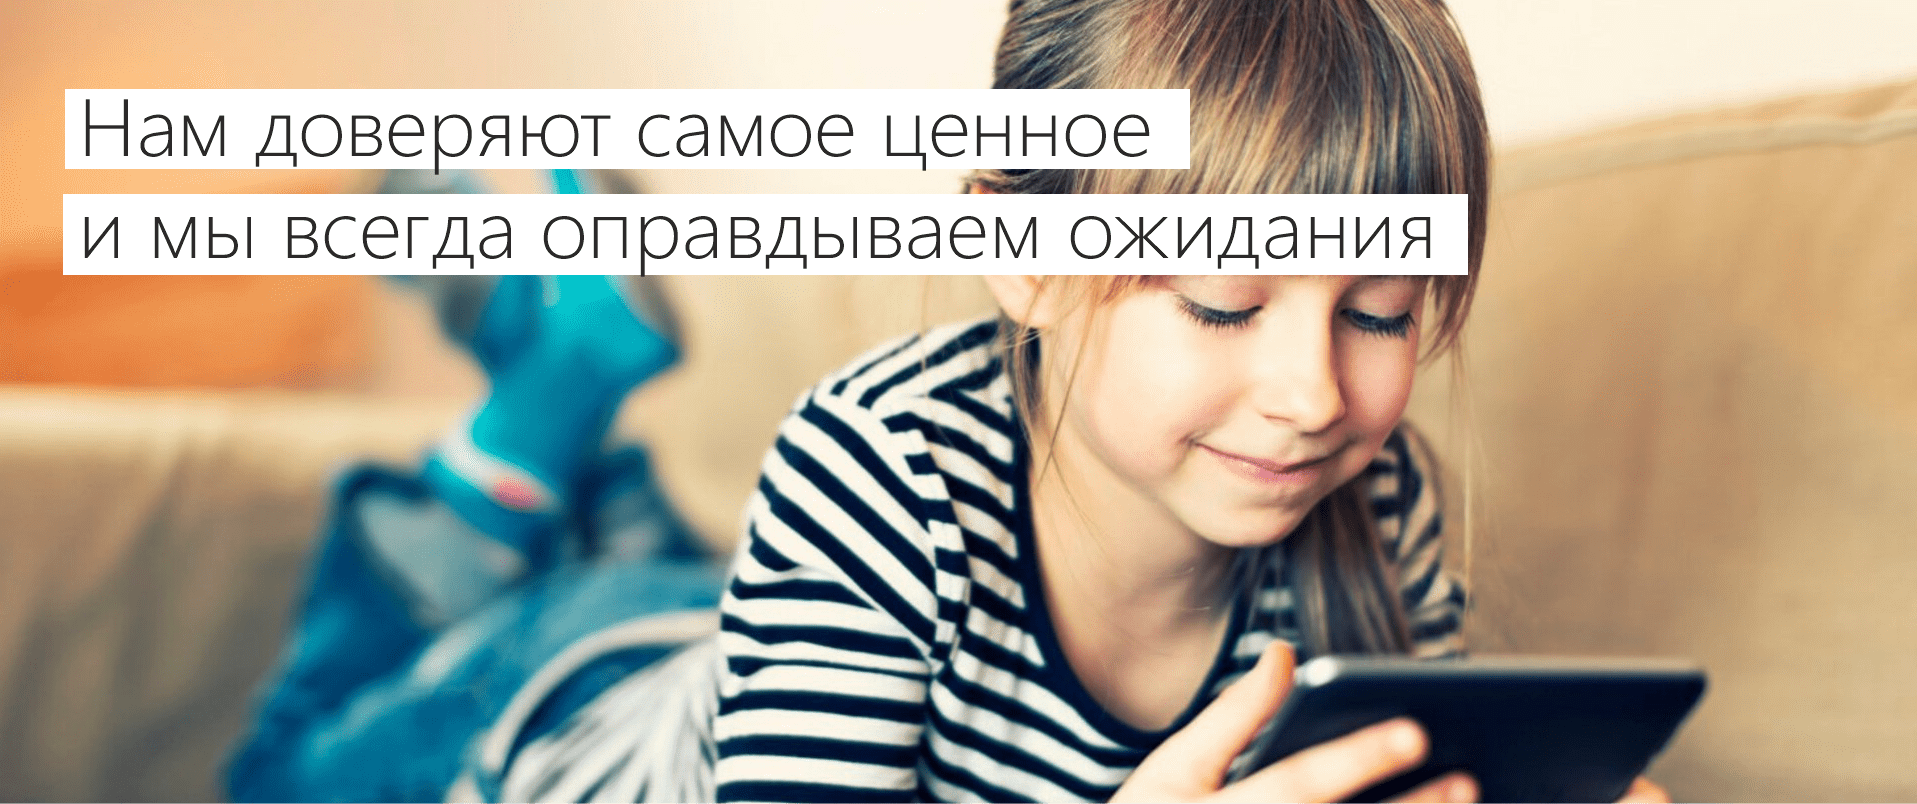 ребёнок за компьютером (1)